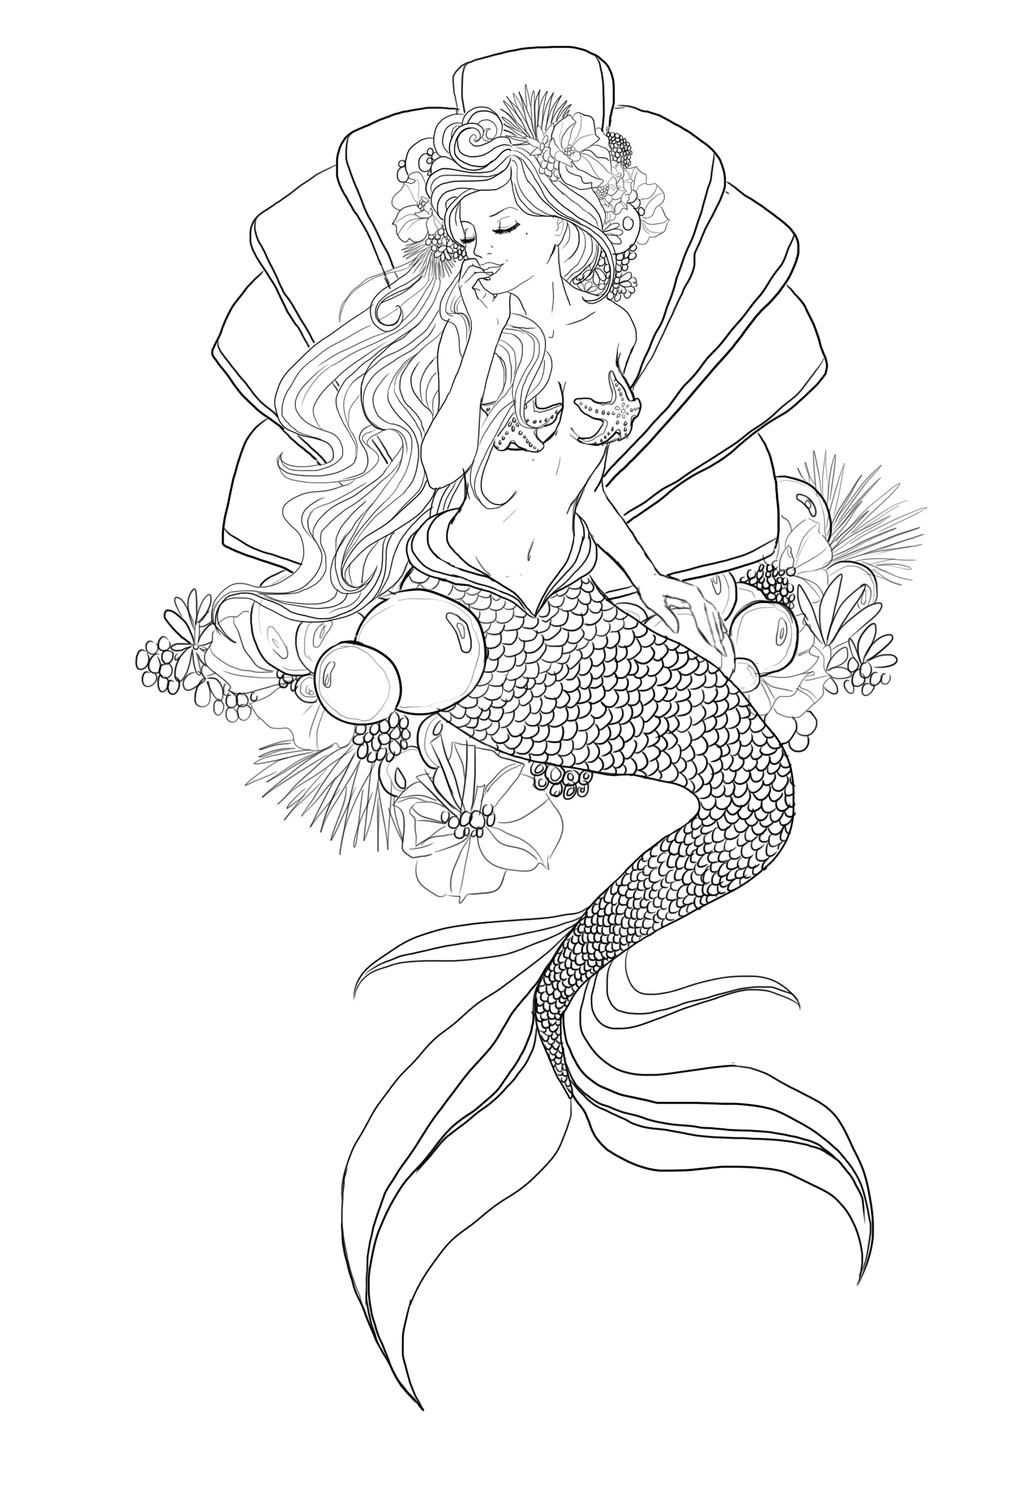 Mermaid By Dadalife01 Zeemeerminkunst Kleurplaten Zeemeerminnen